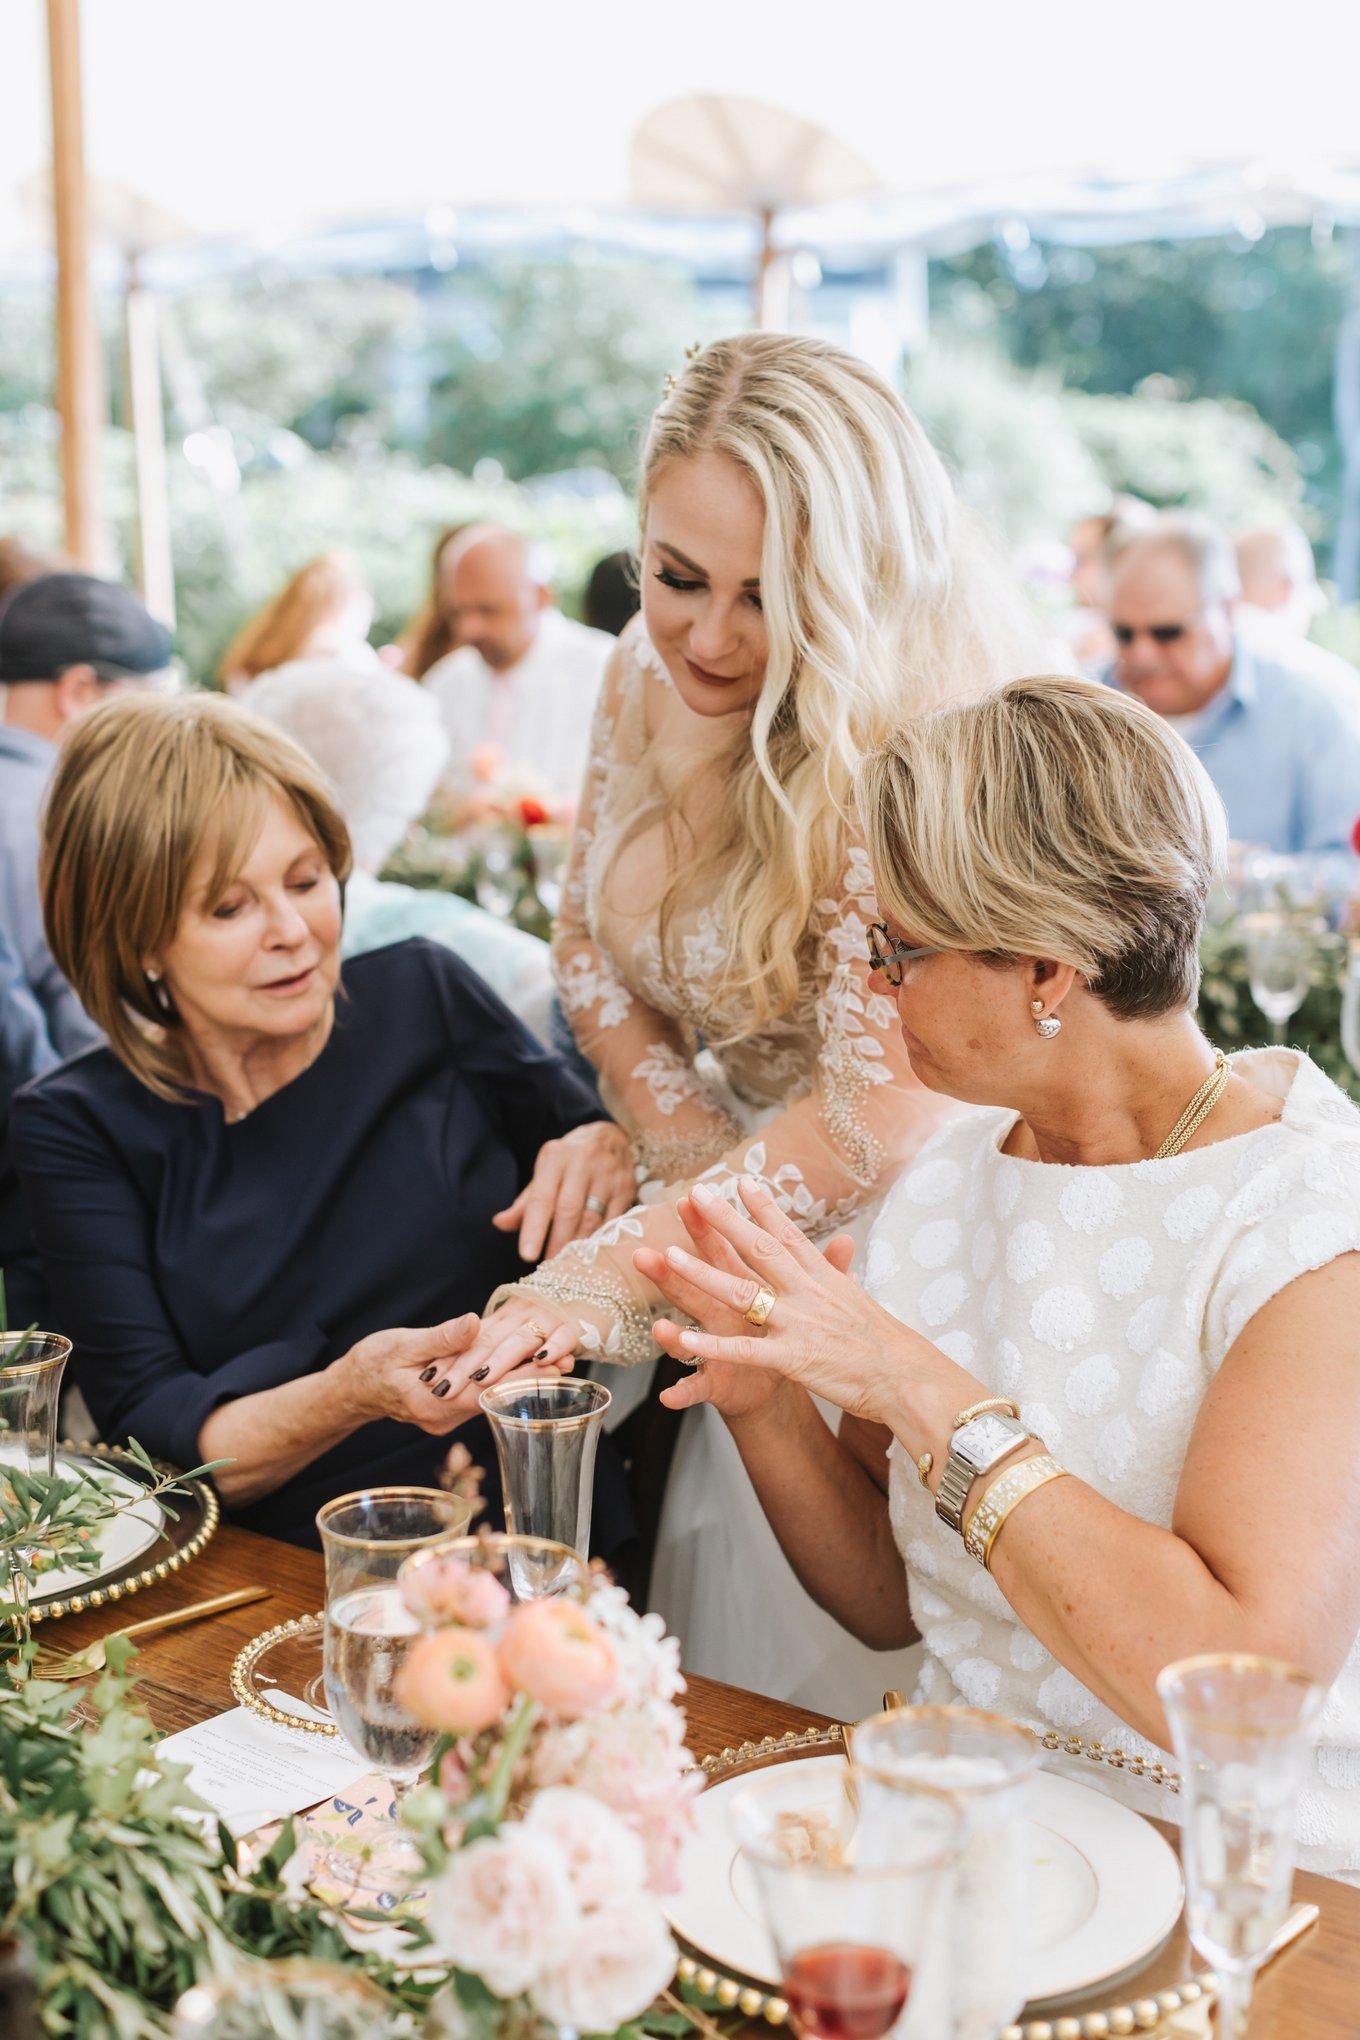 Marthas-Vineyard-Wedding-Photographer-Beach-Plum-Inn-38.jpg